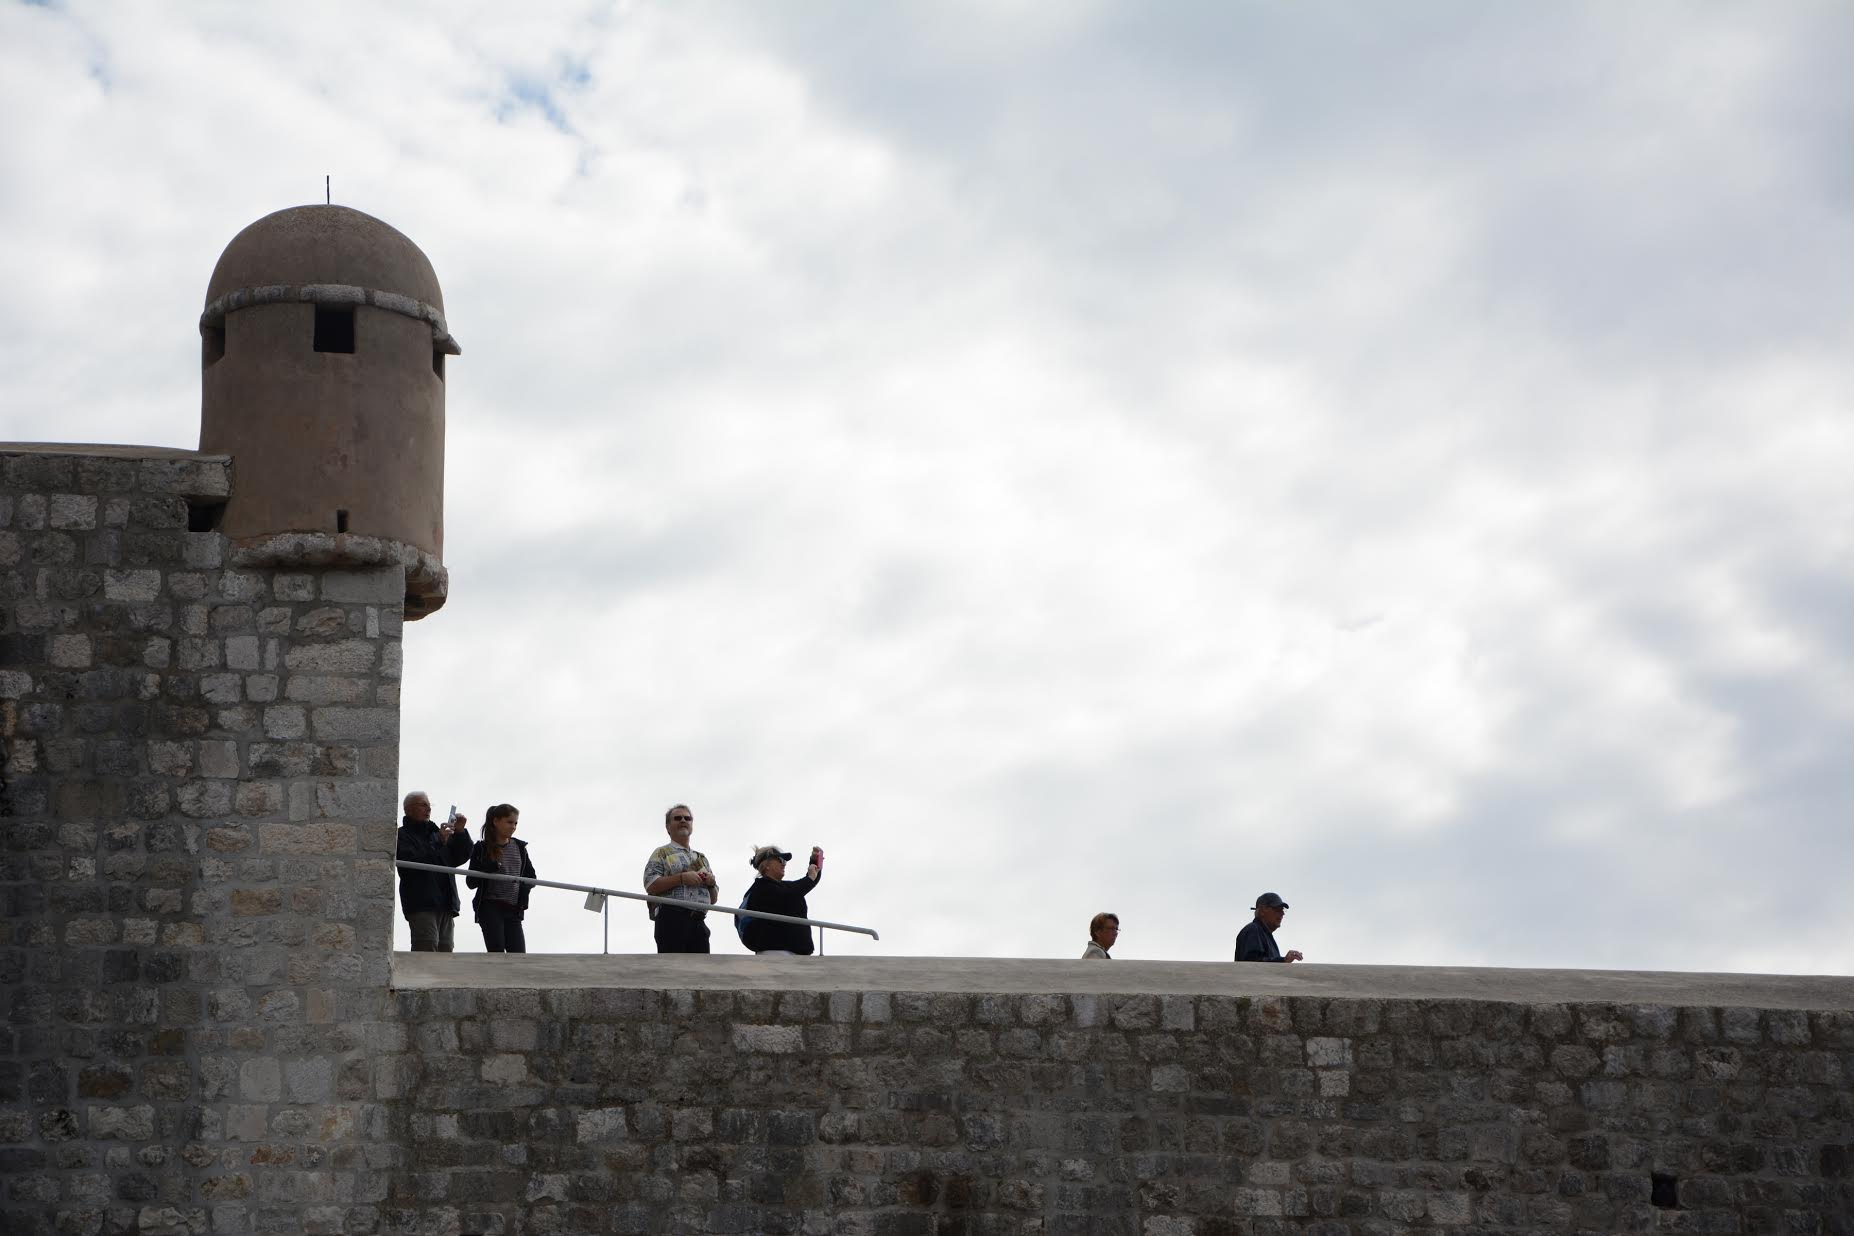 zidine-the-city-walls-dubrovnik-godubrovnik